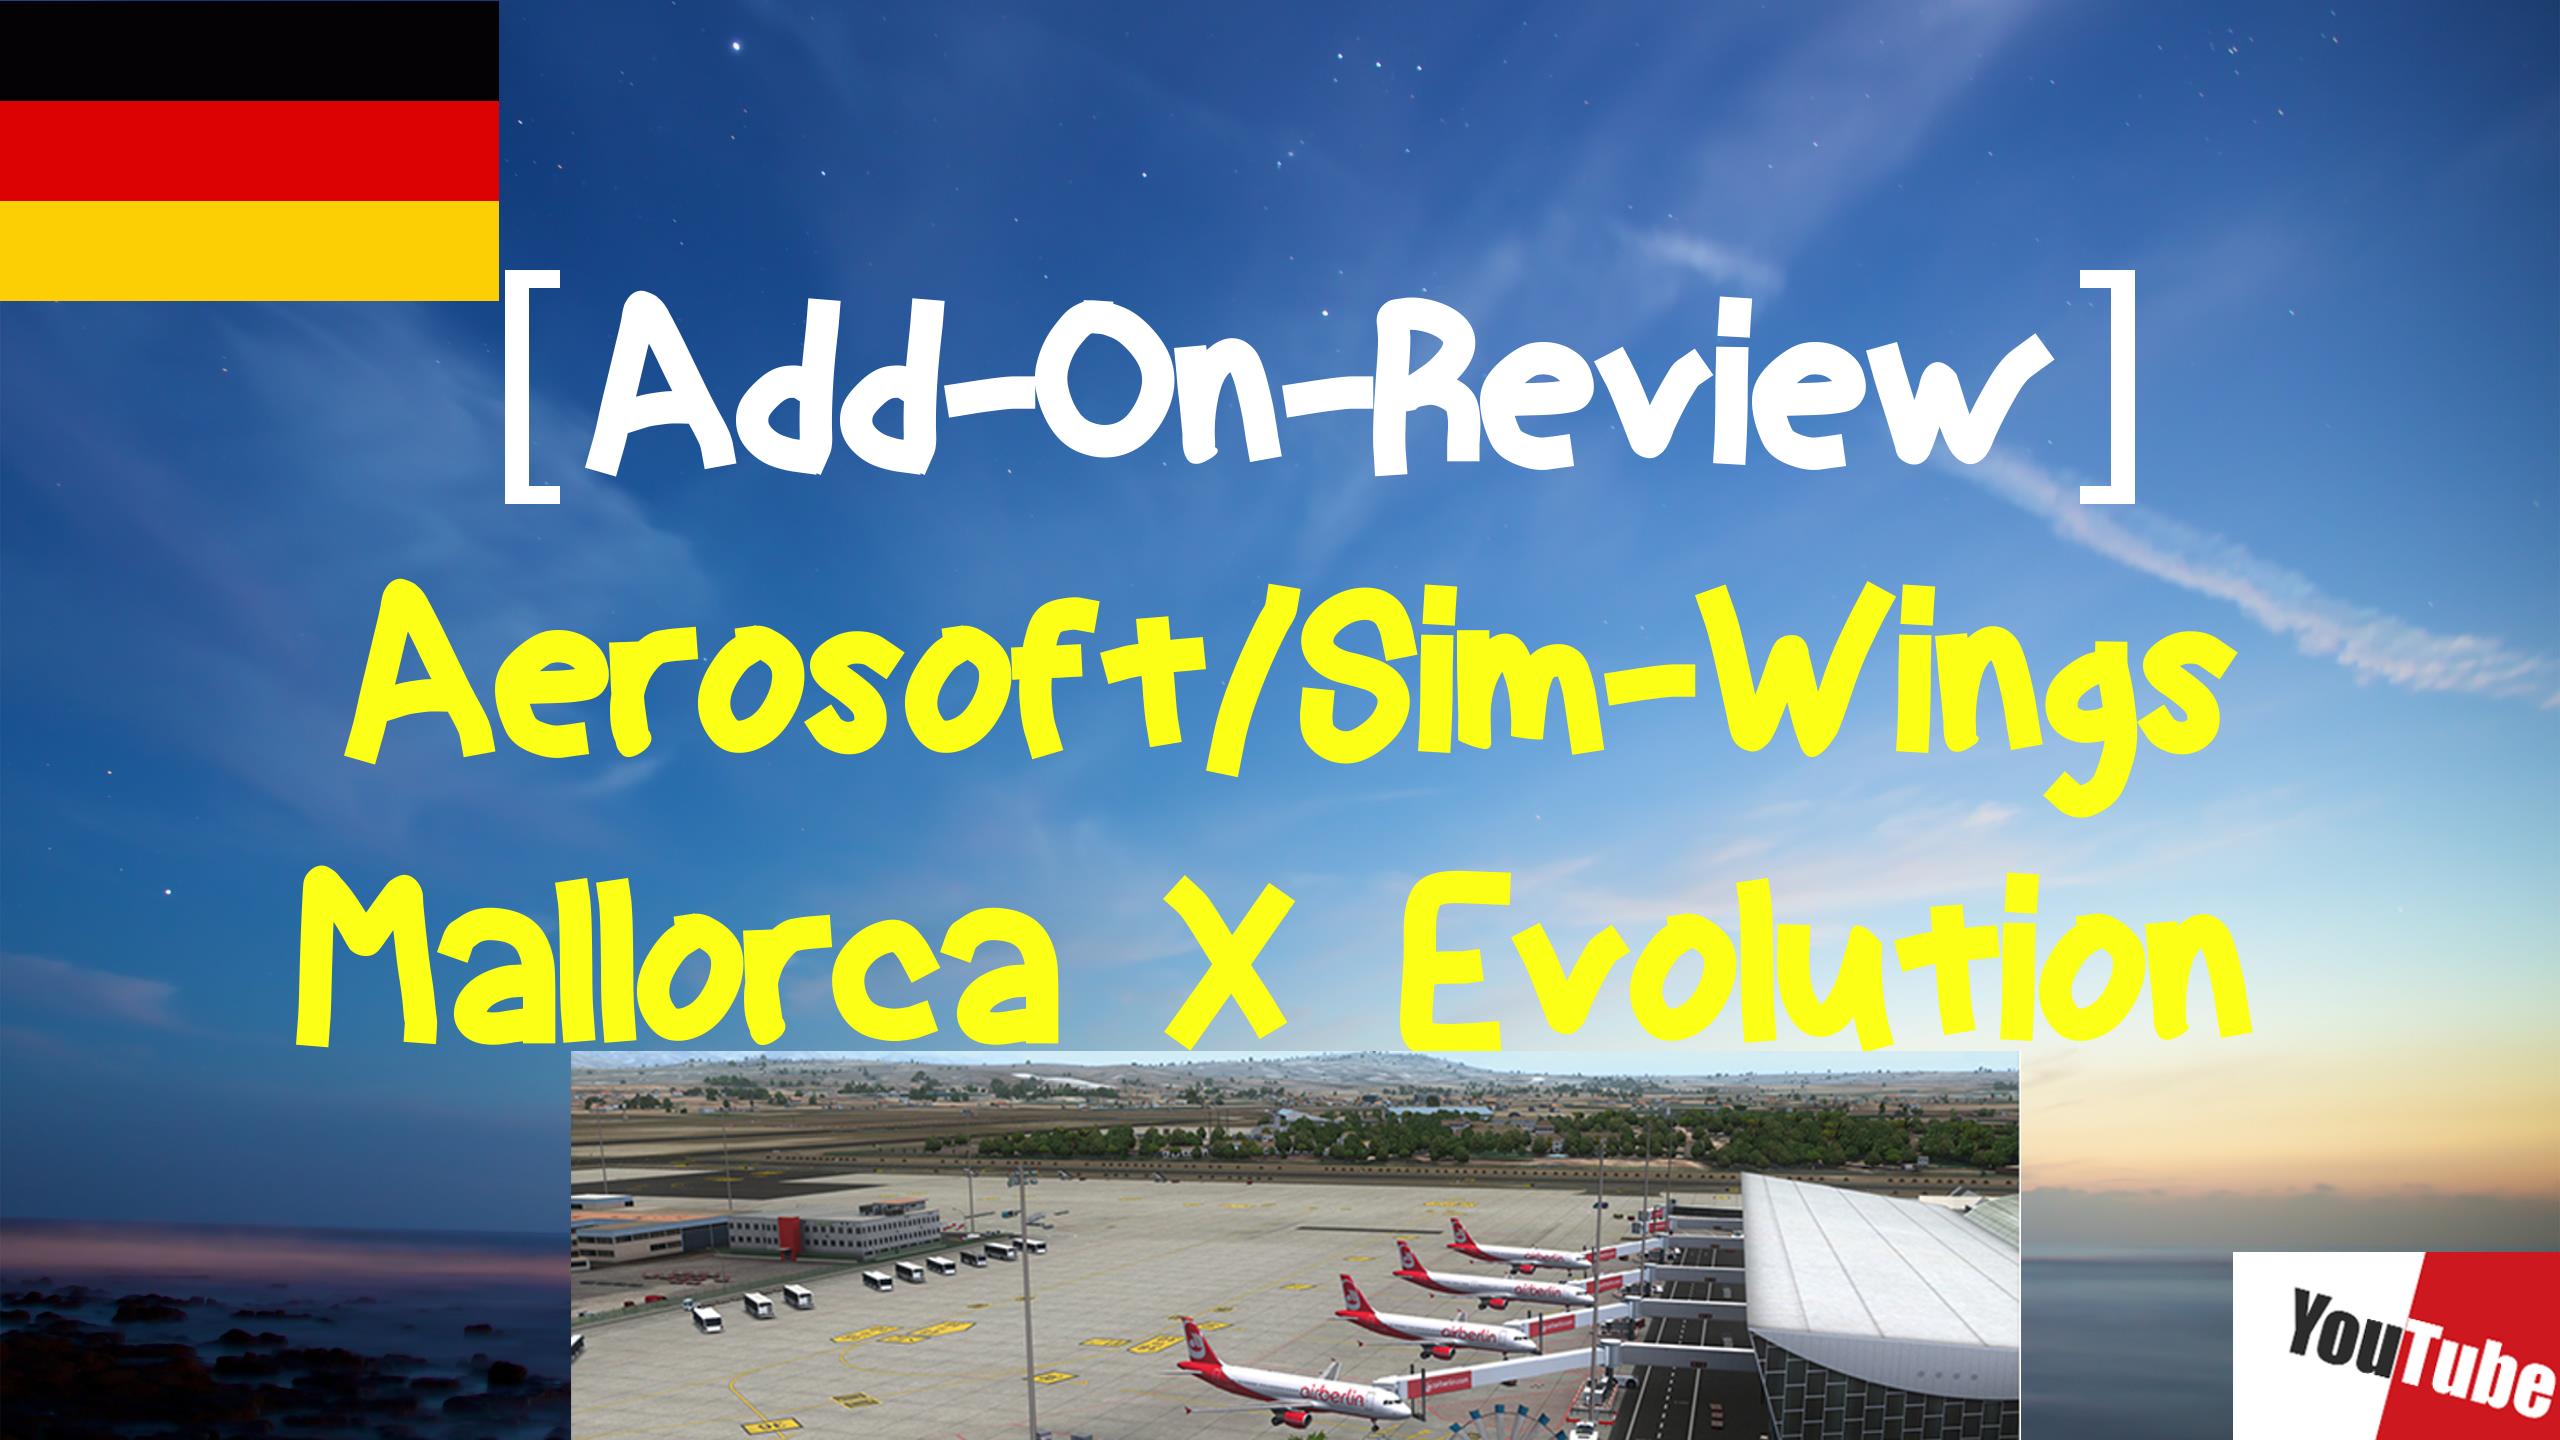 Aerosoft/Sim-Wings Mallorca X Evolution Review